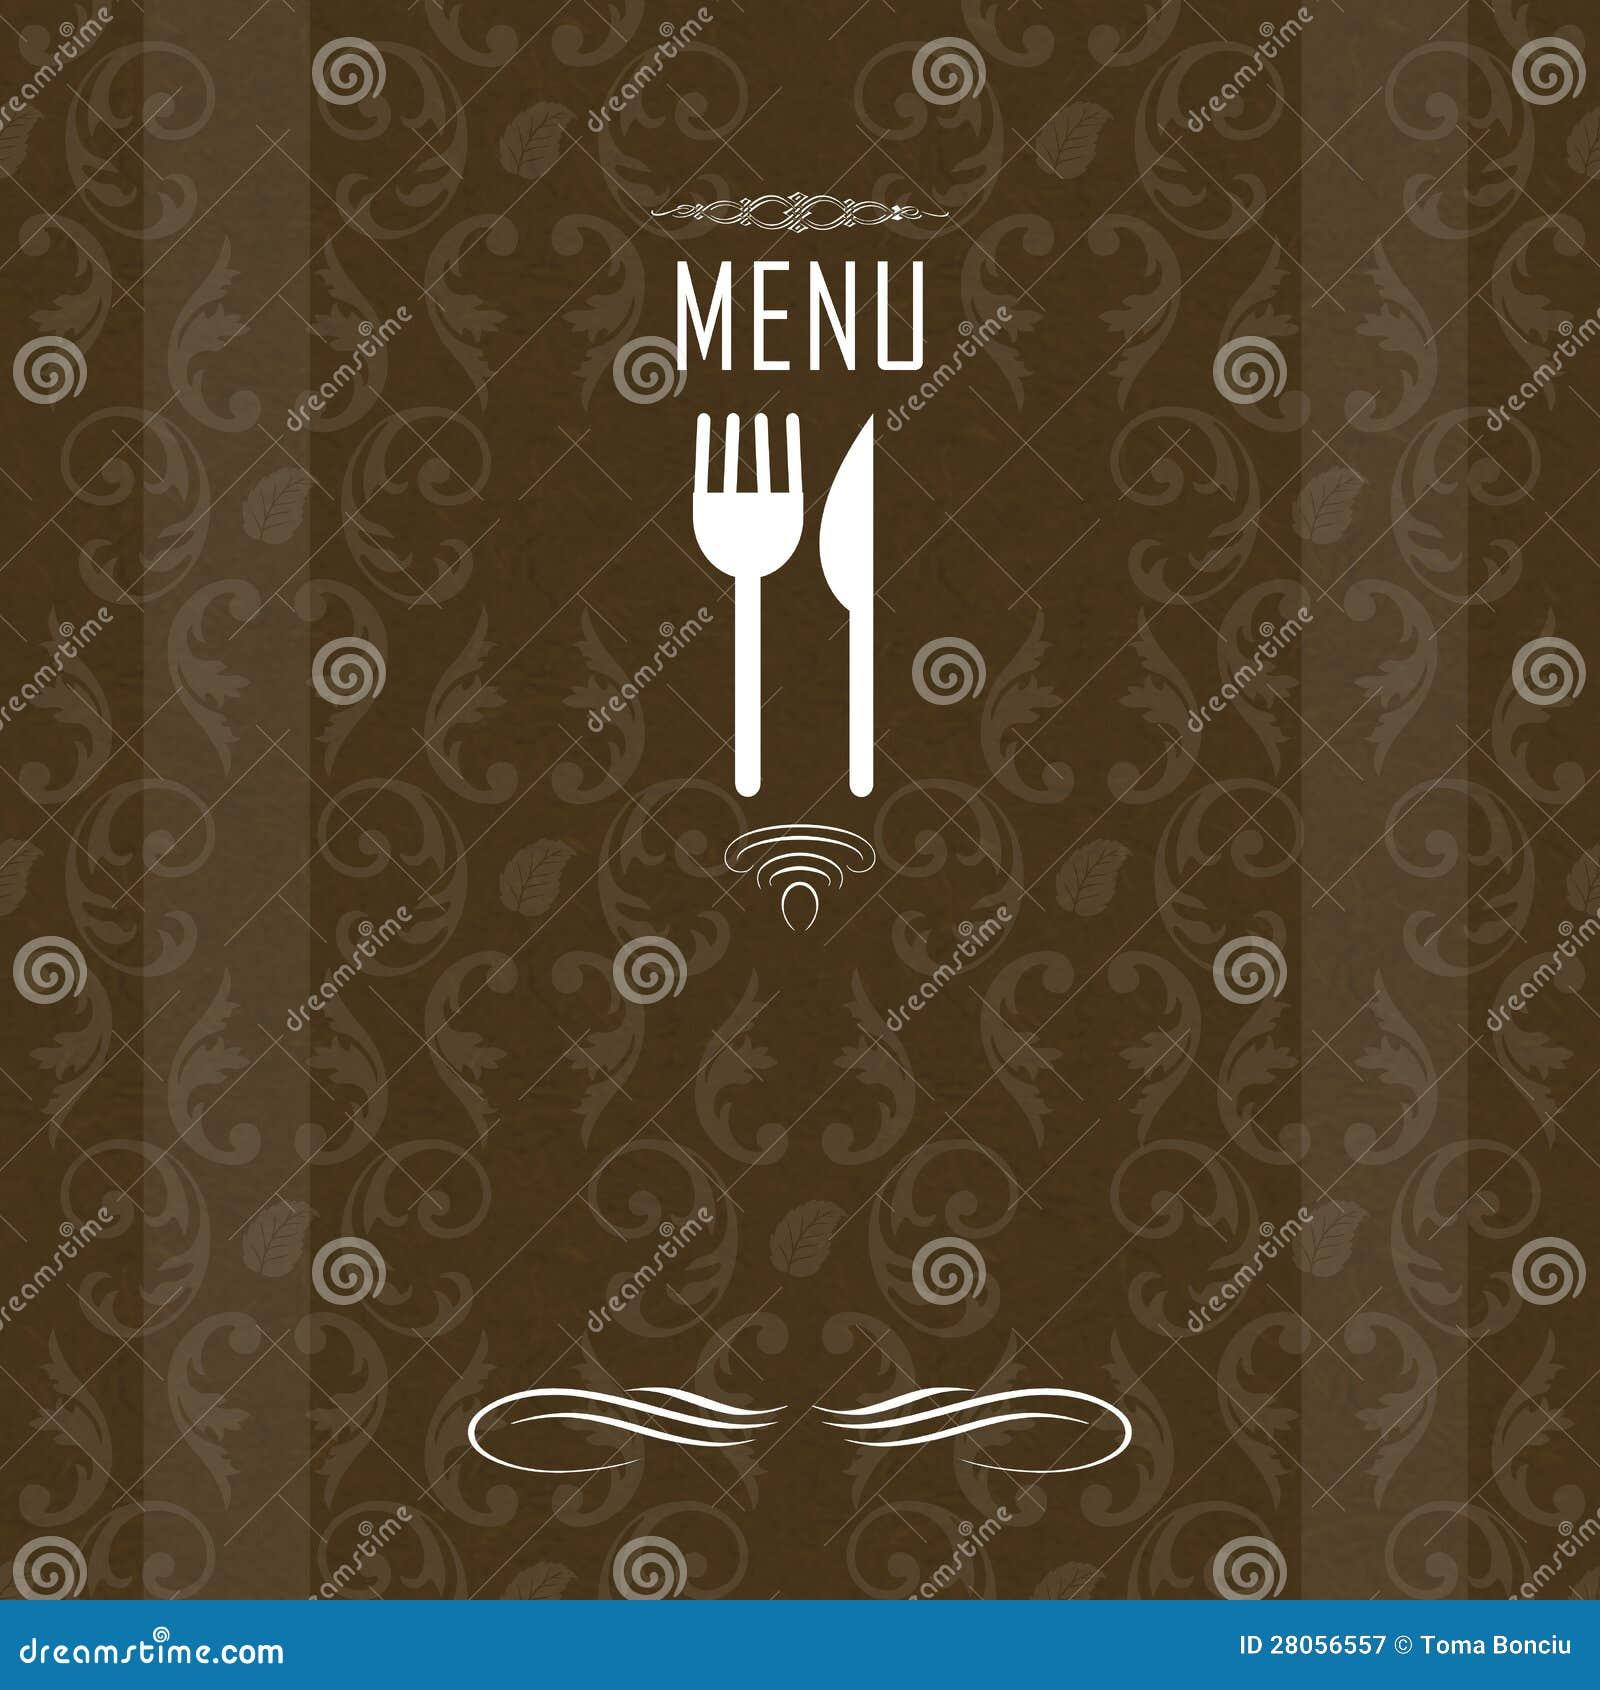 Elegant restaurant menu design stock illustration image